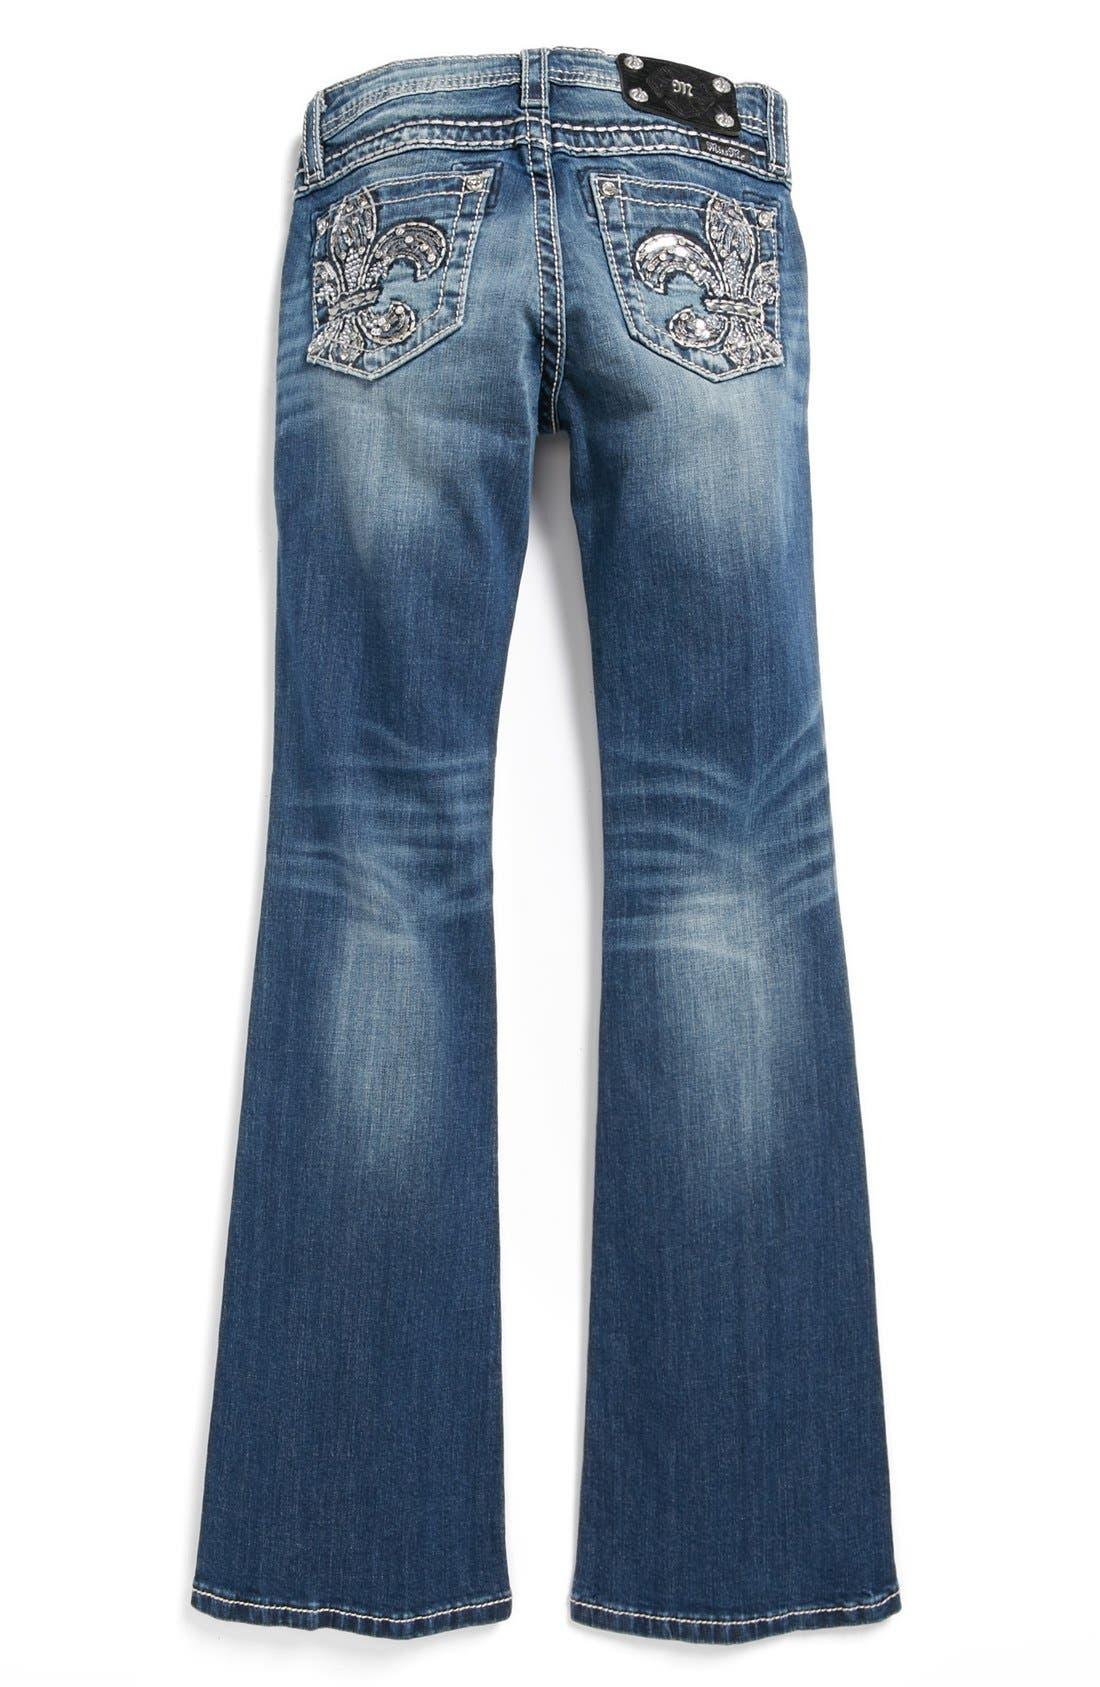 Main Image - Miss Me 'Fleur de Lis' Skinny Jeans (Big Girls)